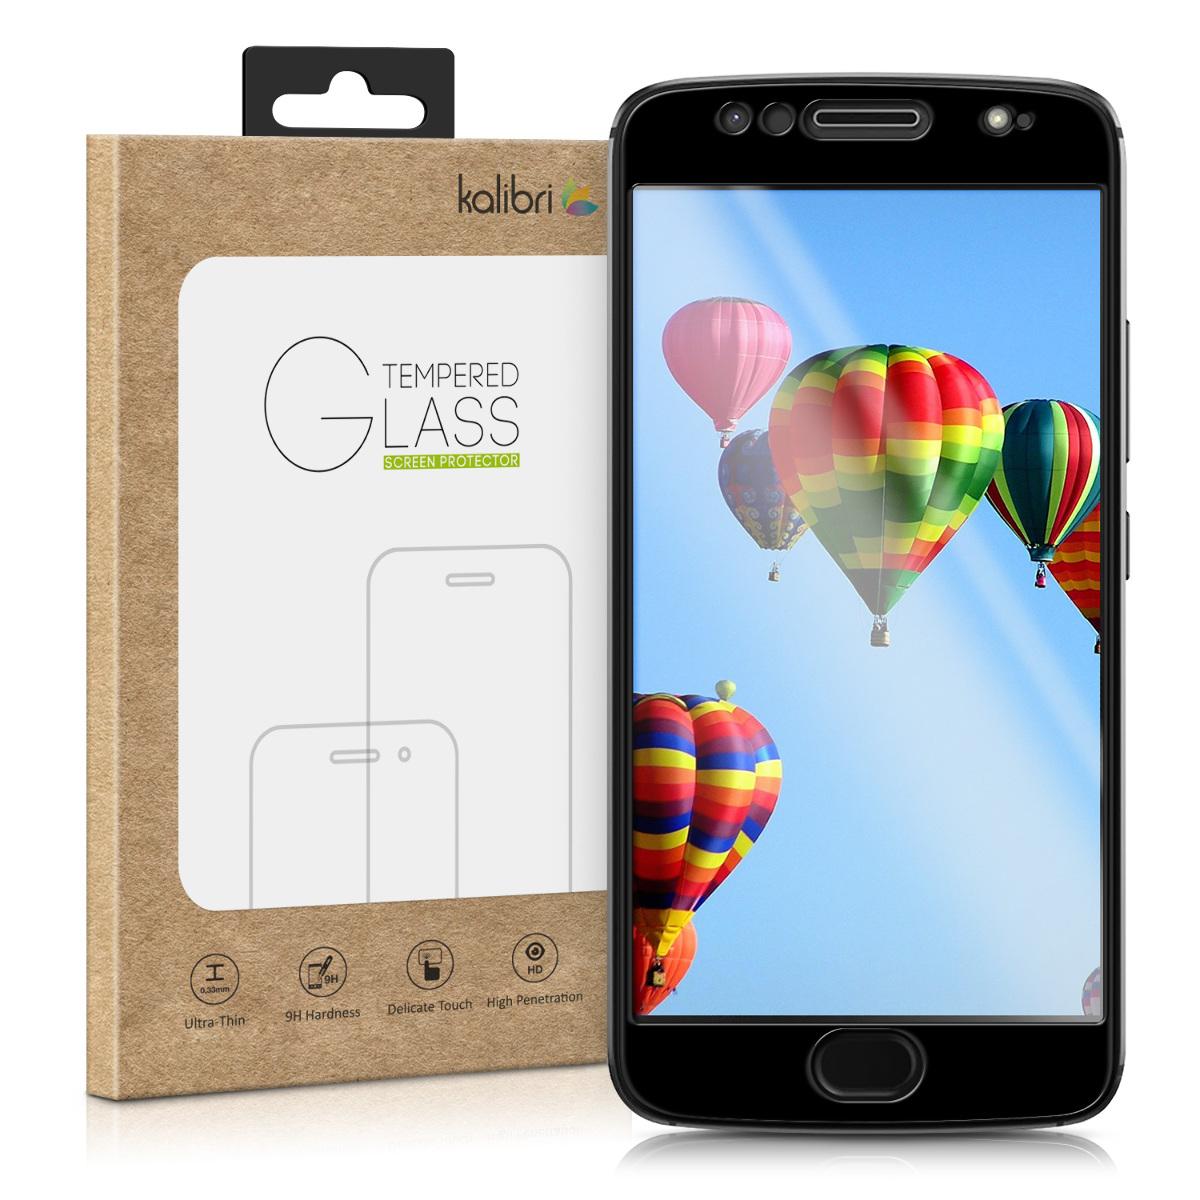 Kalibri Tempered Glass - Fullface Αντιχαρακτικό Γυαλί Οθόνης Motorola Moto G5S - Black (43760.01)